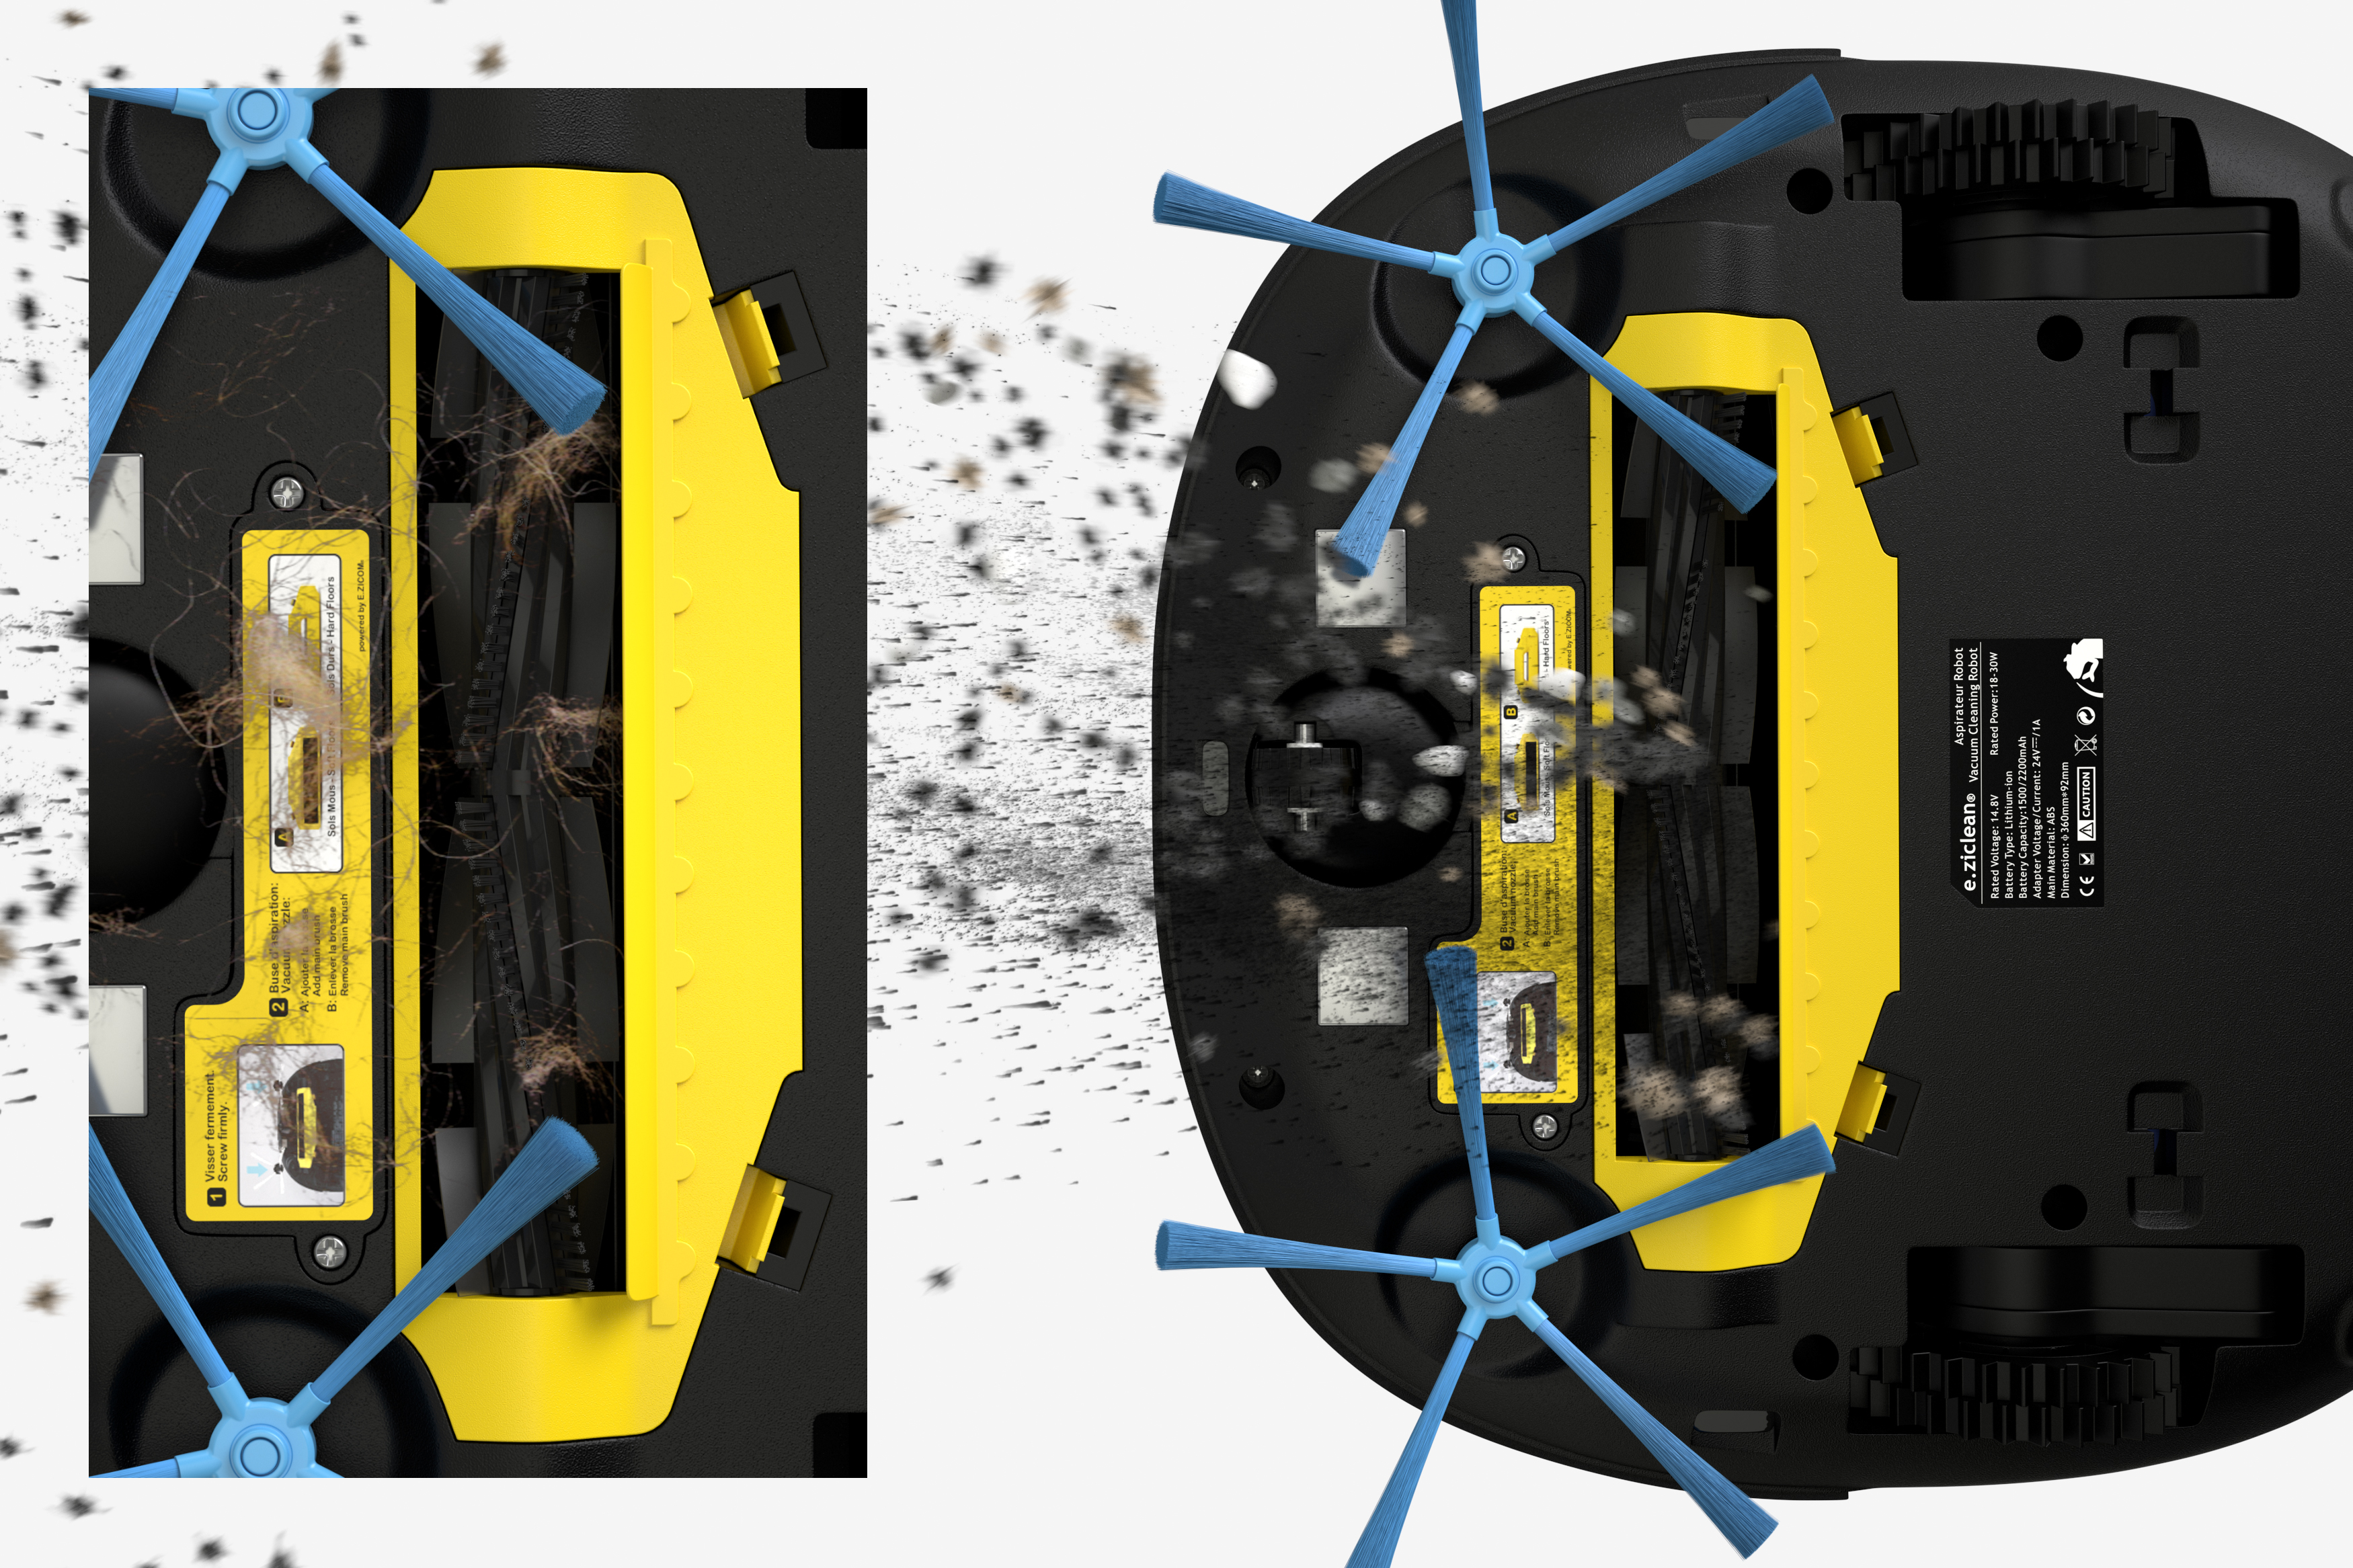 robot aspirateur sweepy eziclean brosse modulable